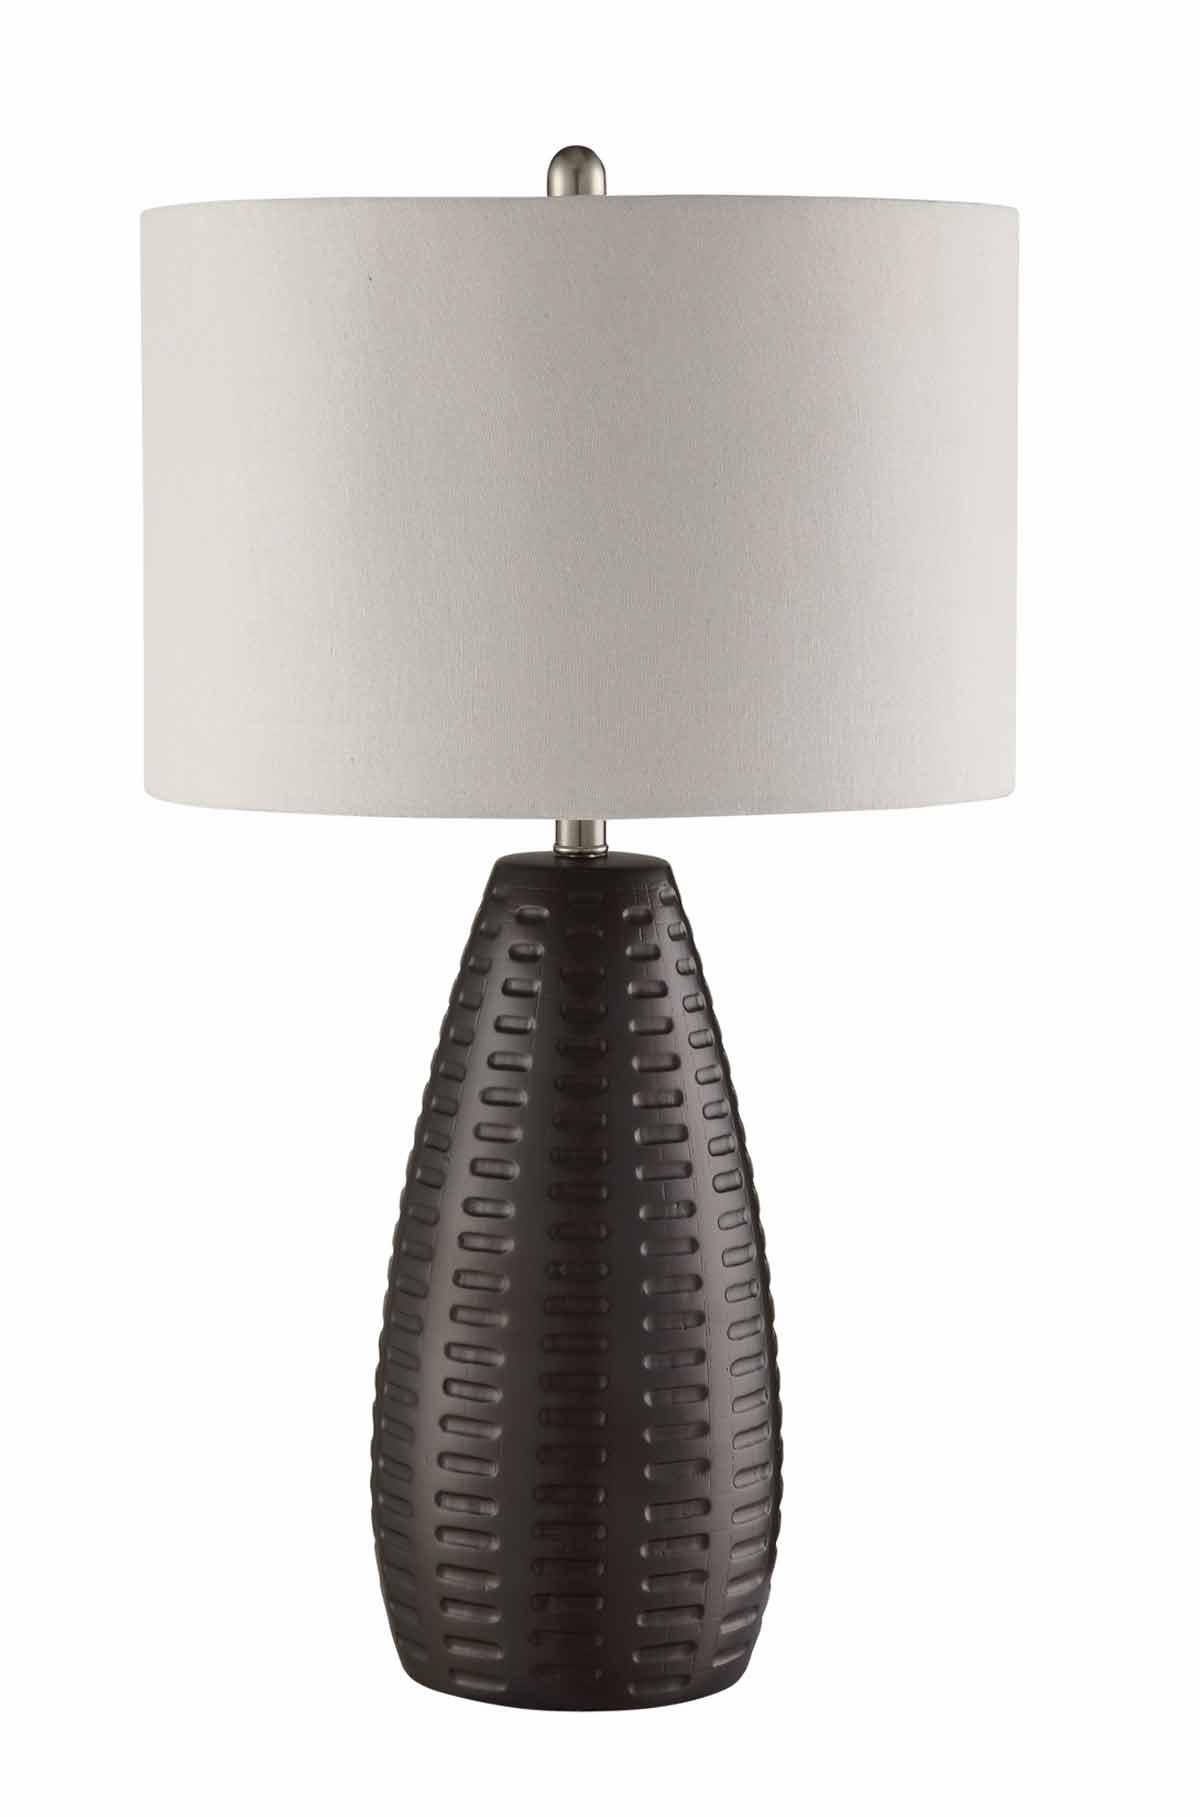 Coaster 901247 Table Lamp - Black